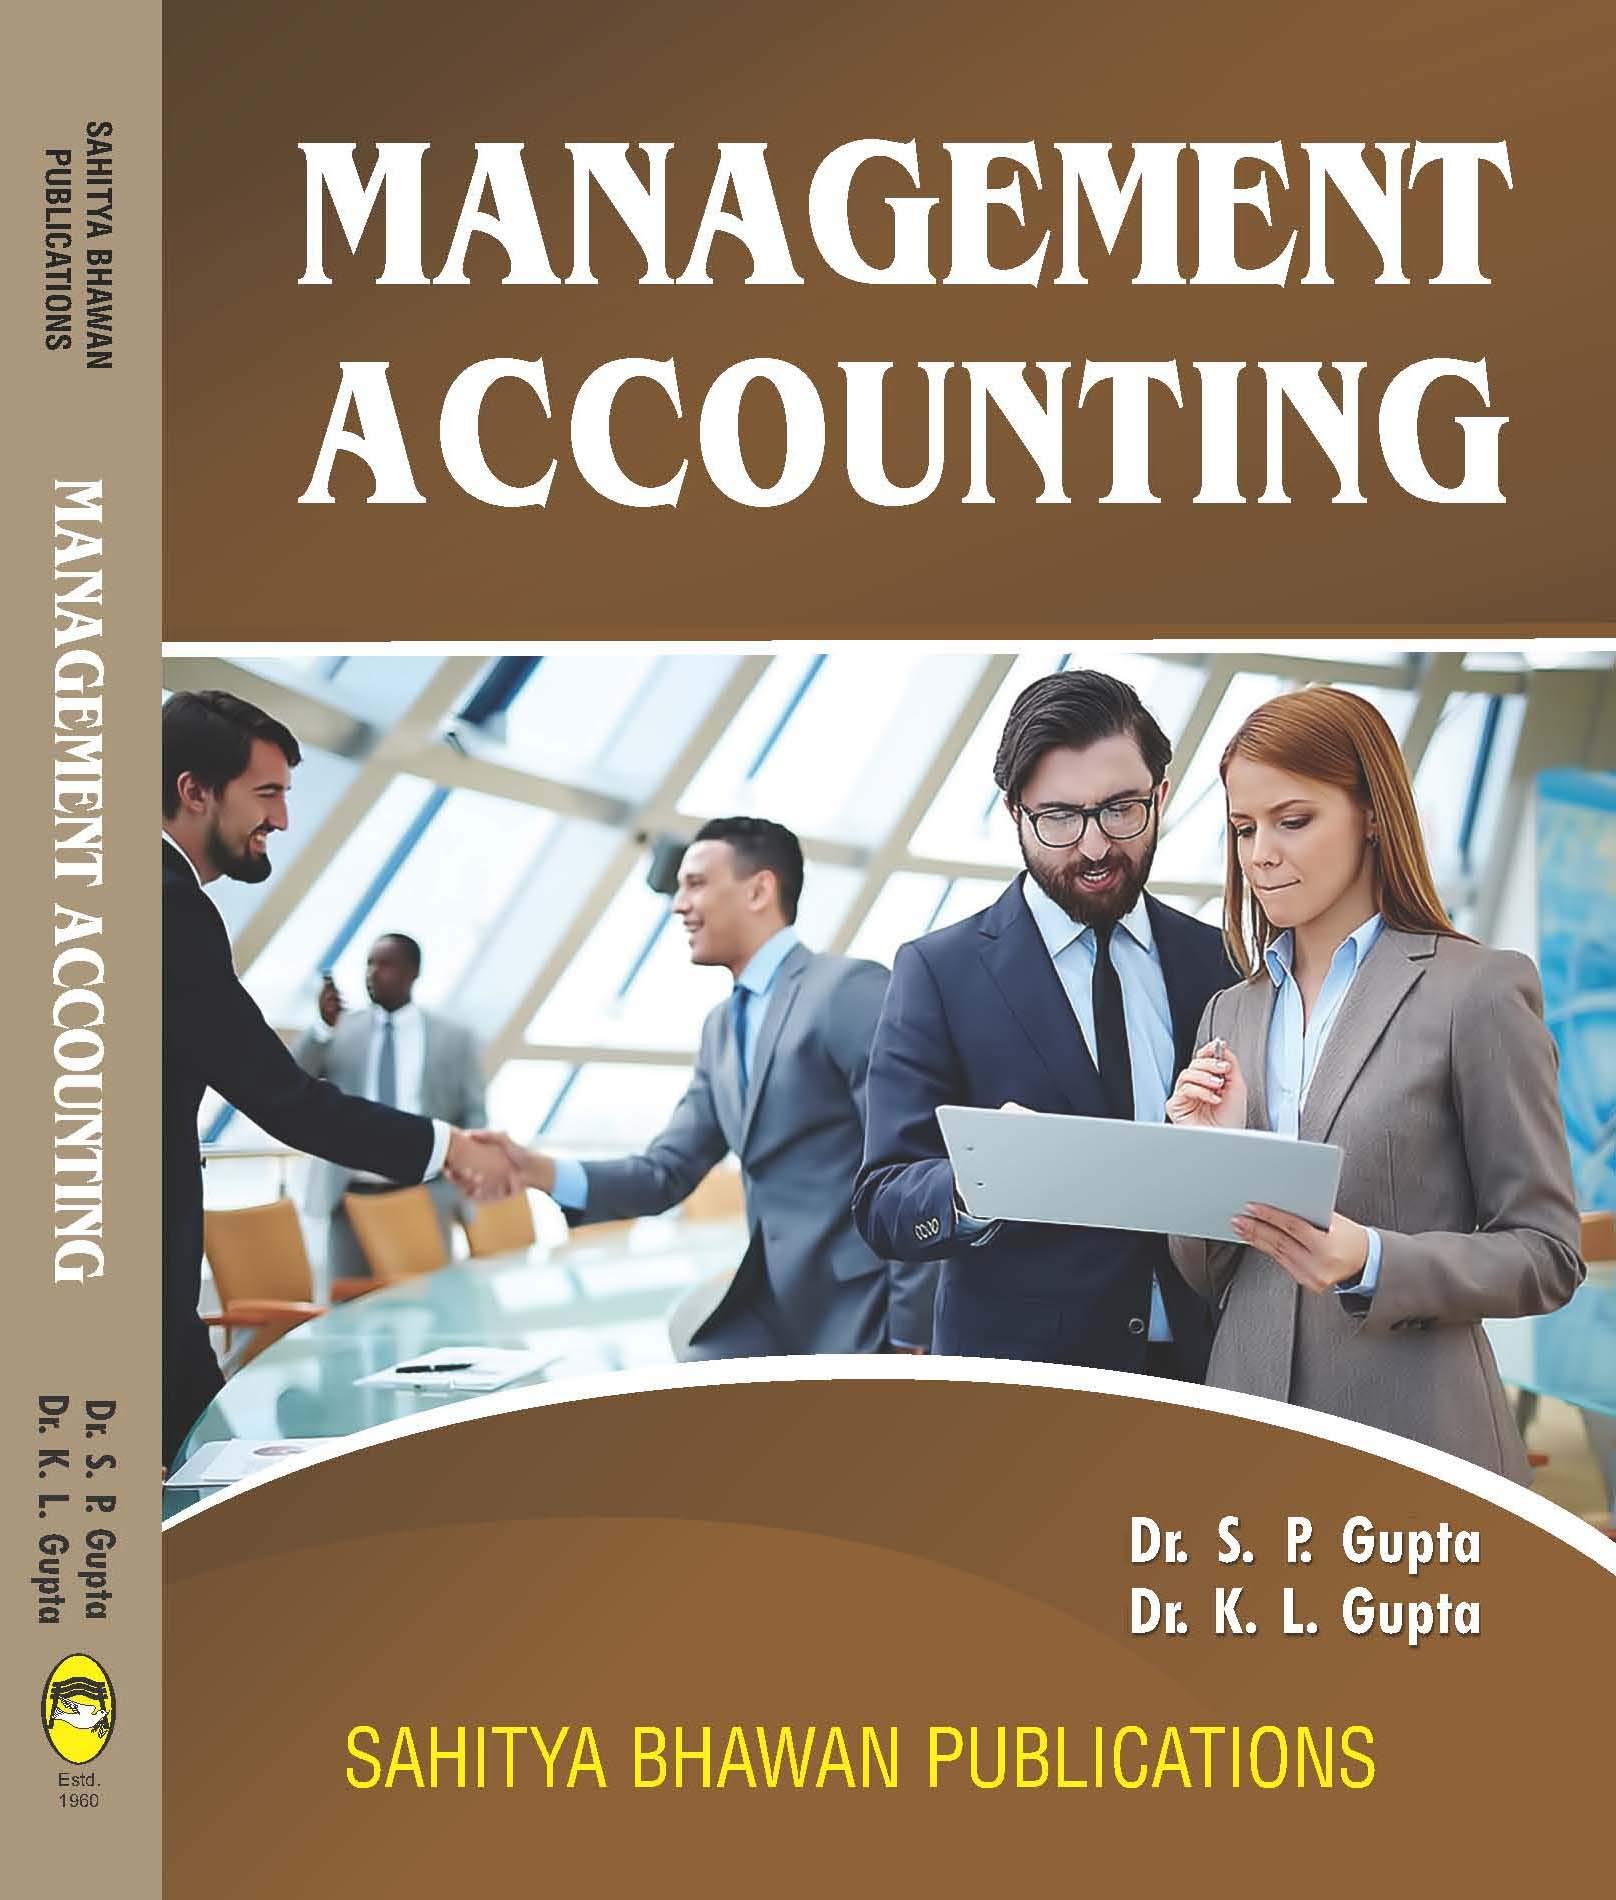 Management Accounting For B.Com. III Year of Awadhesh Pratap Singh University Rewa, Barkatullah University Bhopal, Dr. Harisingh Gour University Sagar, Rani Durgavati Vishwavidyalaya Jabalpur, Vikram University Ujjain